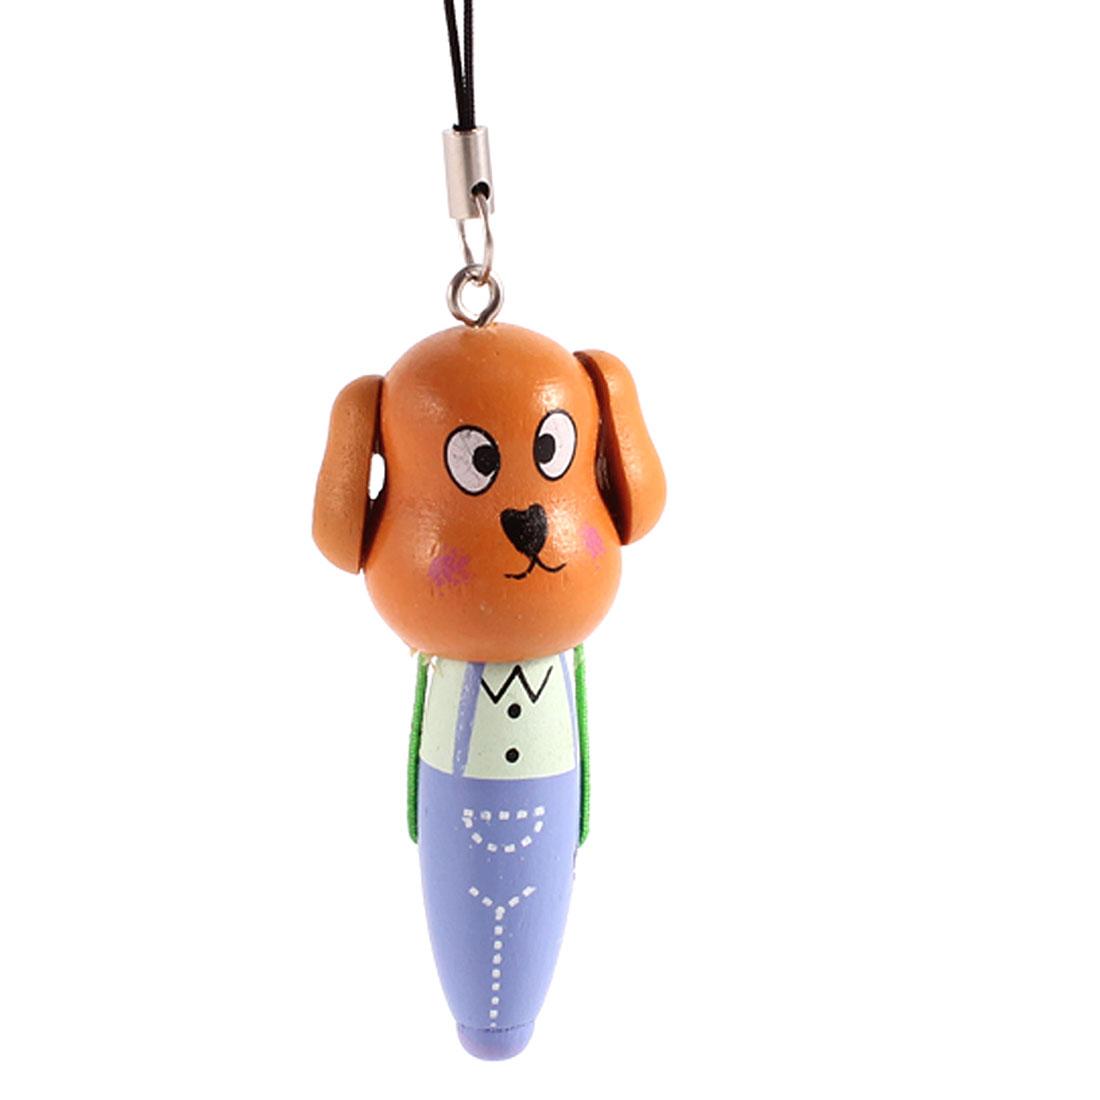 Orange Plastic Ballpoint Design Cartoon Dog Dangle Phone Hanging Strap Decoration